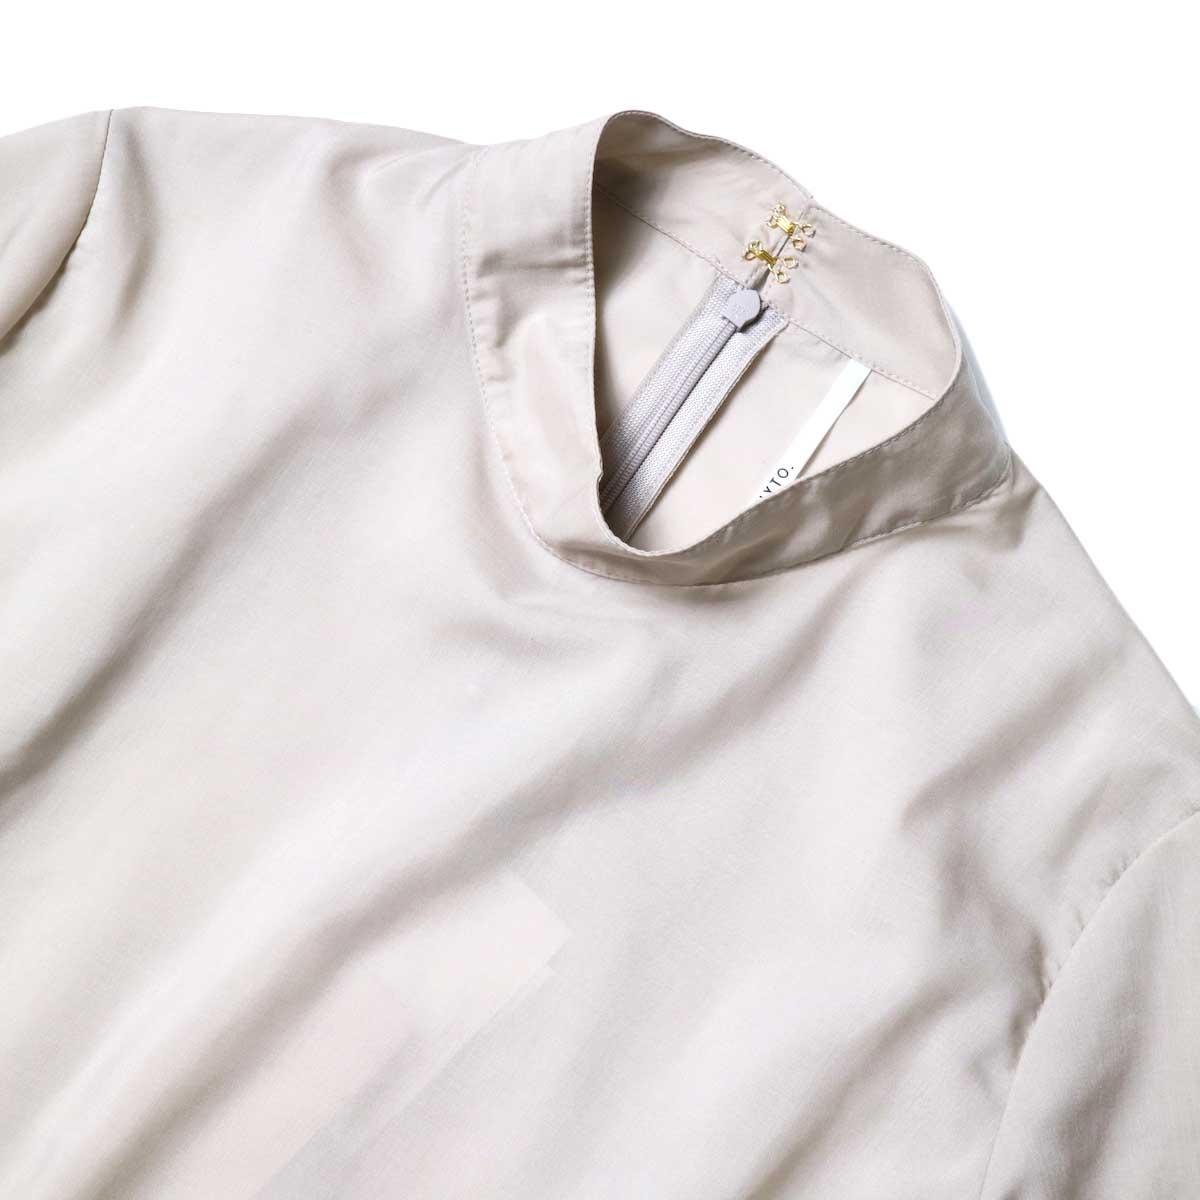 WHYTO. / ベルマックス スタンドカラー プリーツブラウス (Grayge) 襟